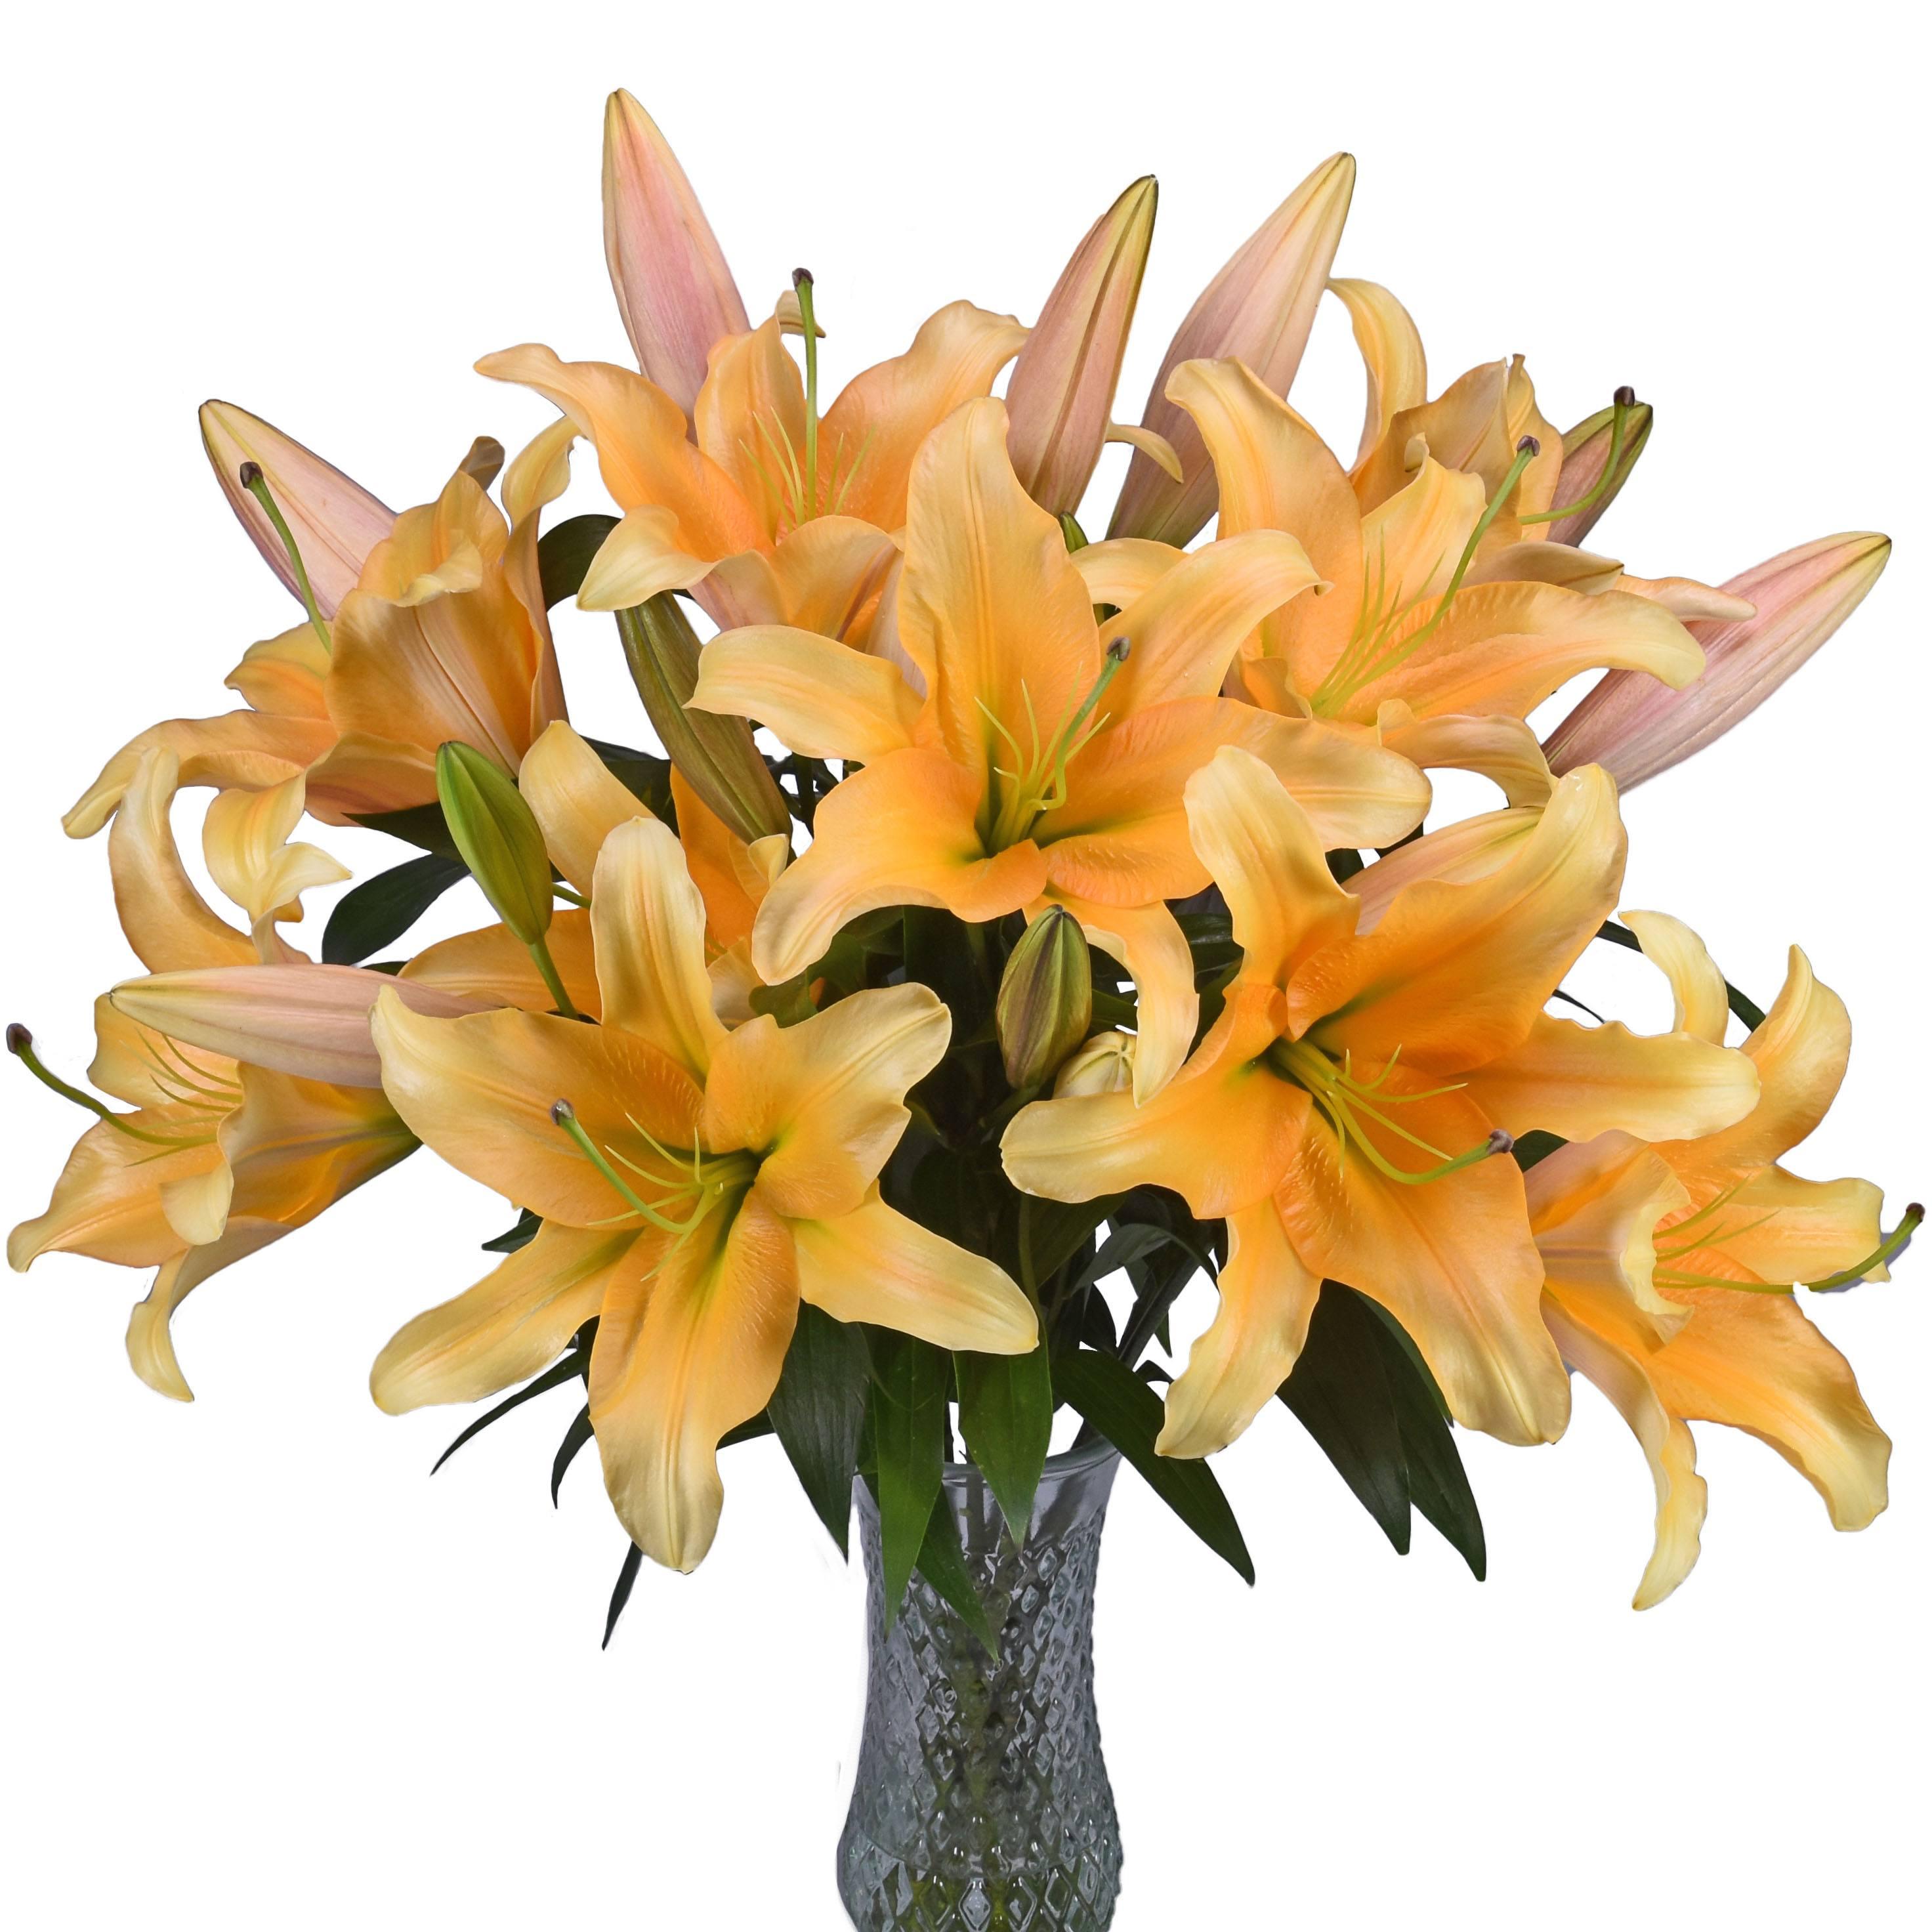 Golden Orange Hybrid Lily Flower